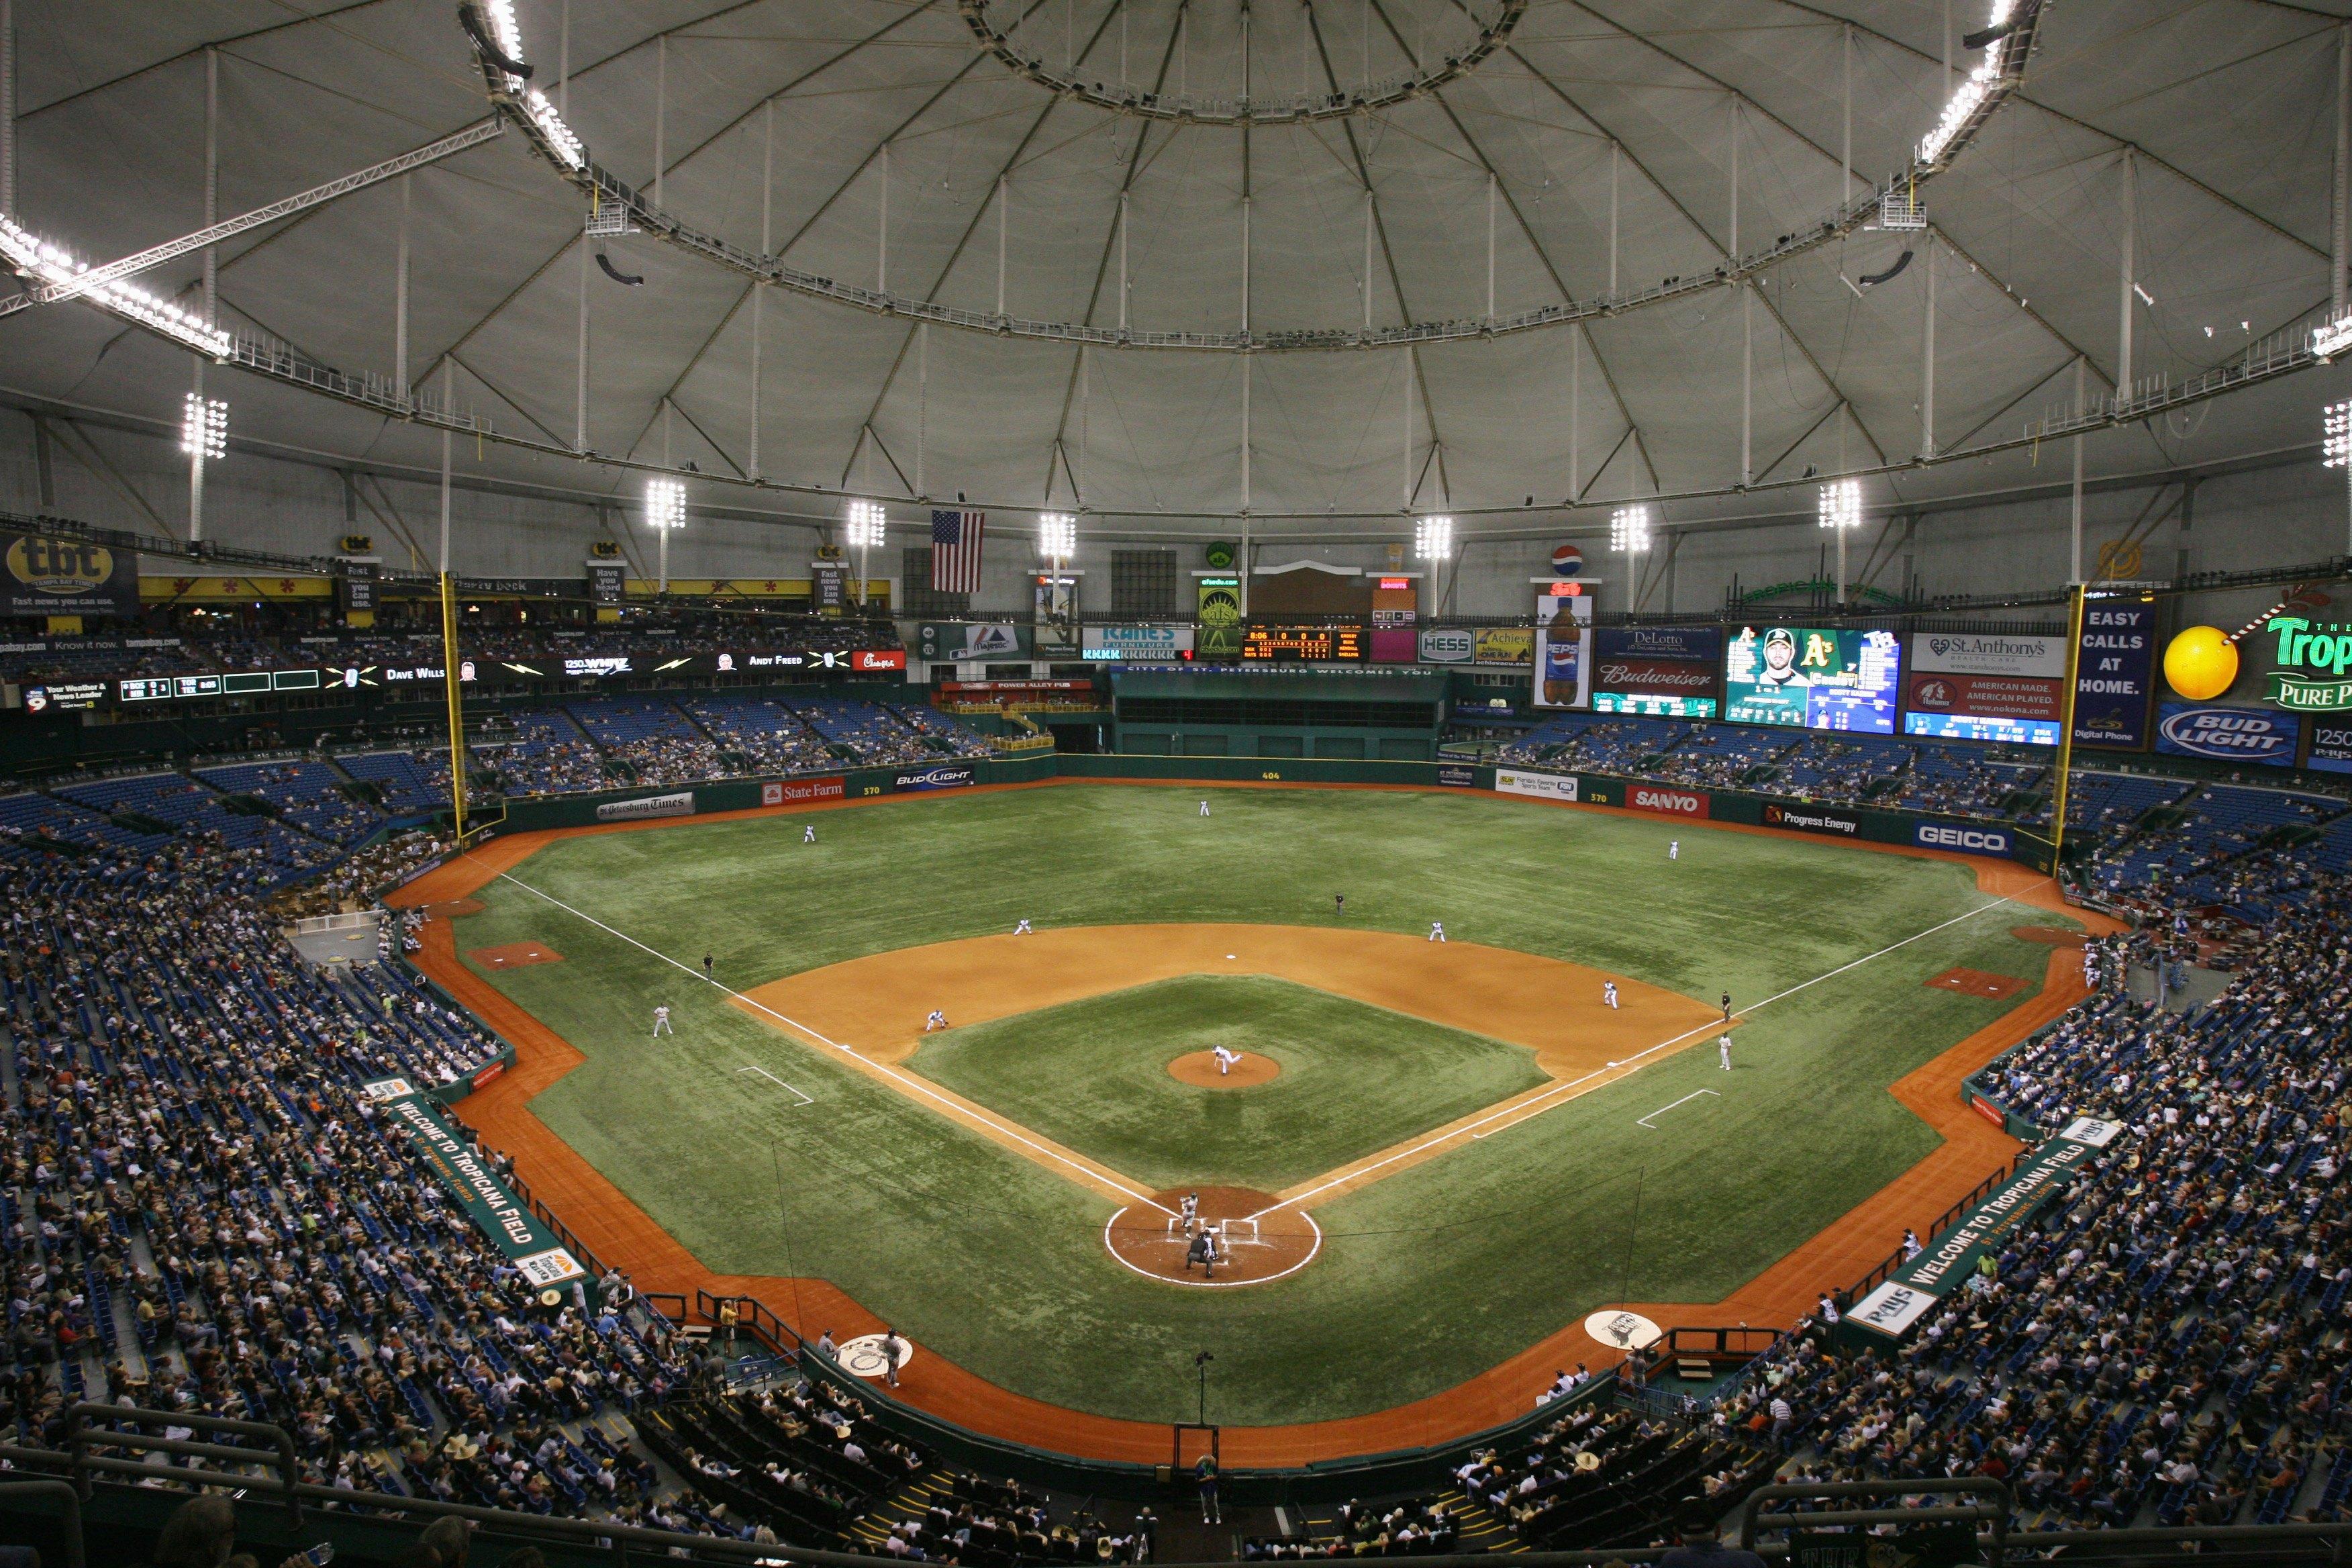 Oakland Athletics v Tampa Bay Devil Rays